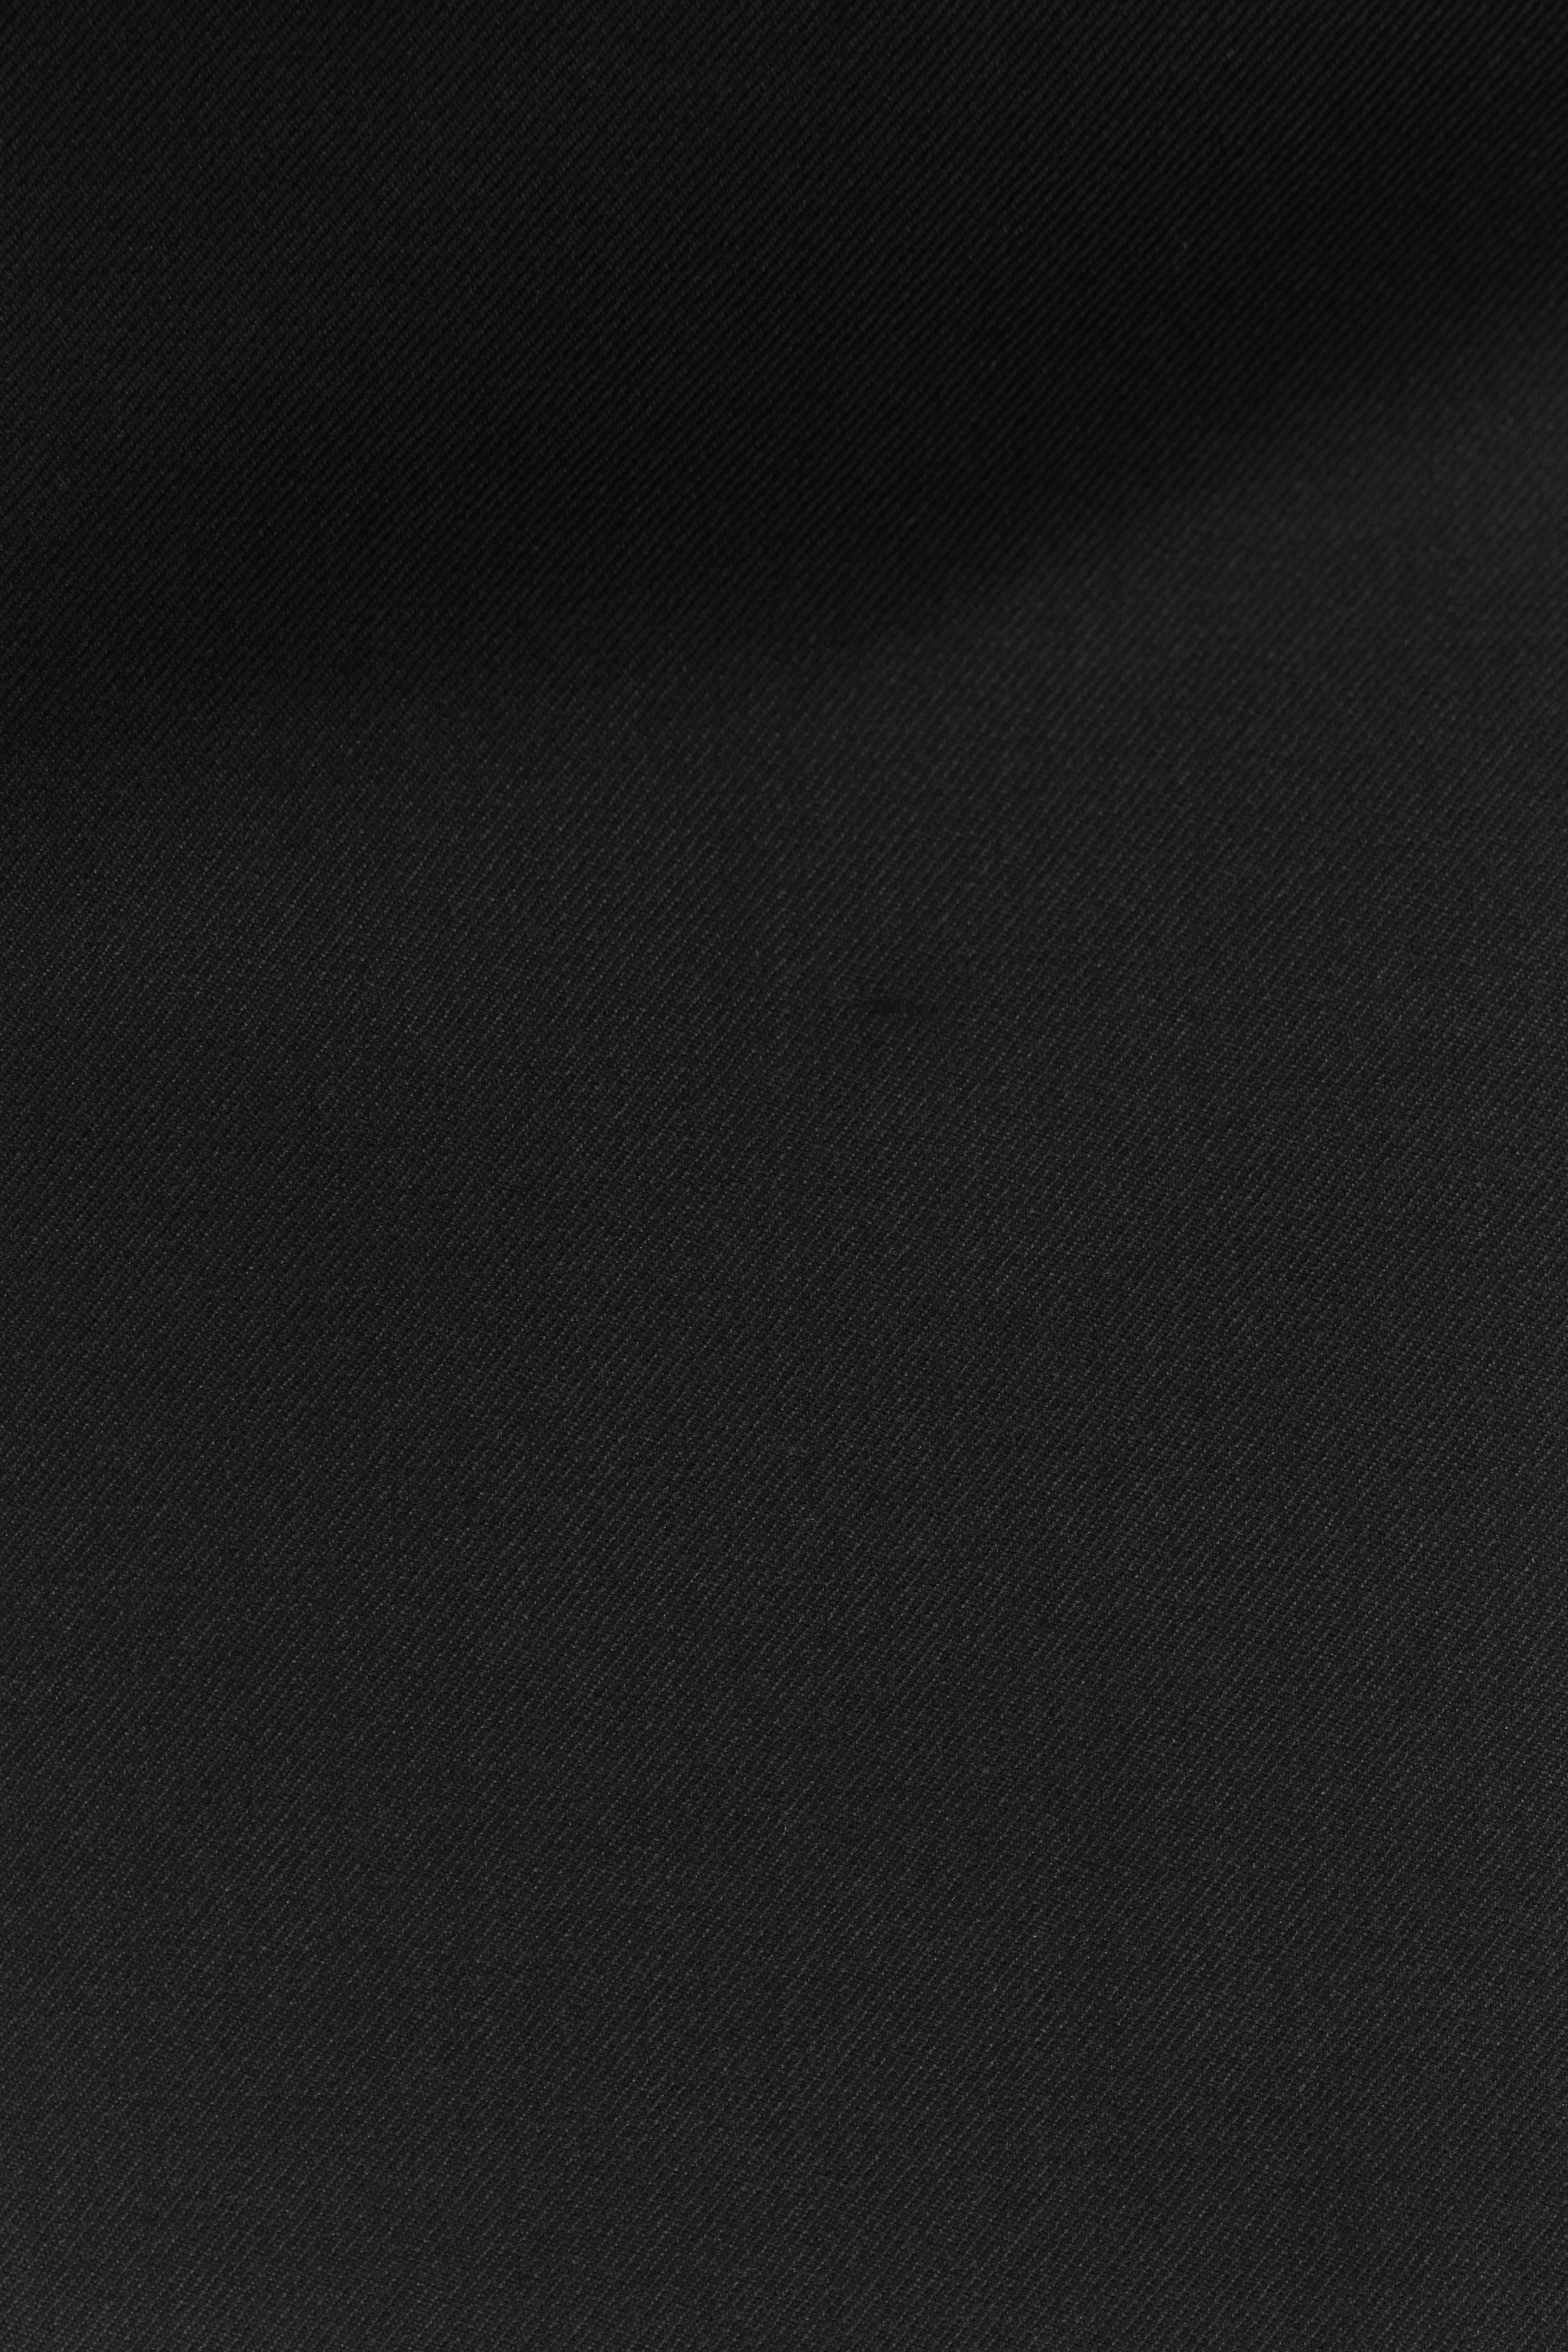 7698 Black Heavy Twill 305g.JPG